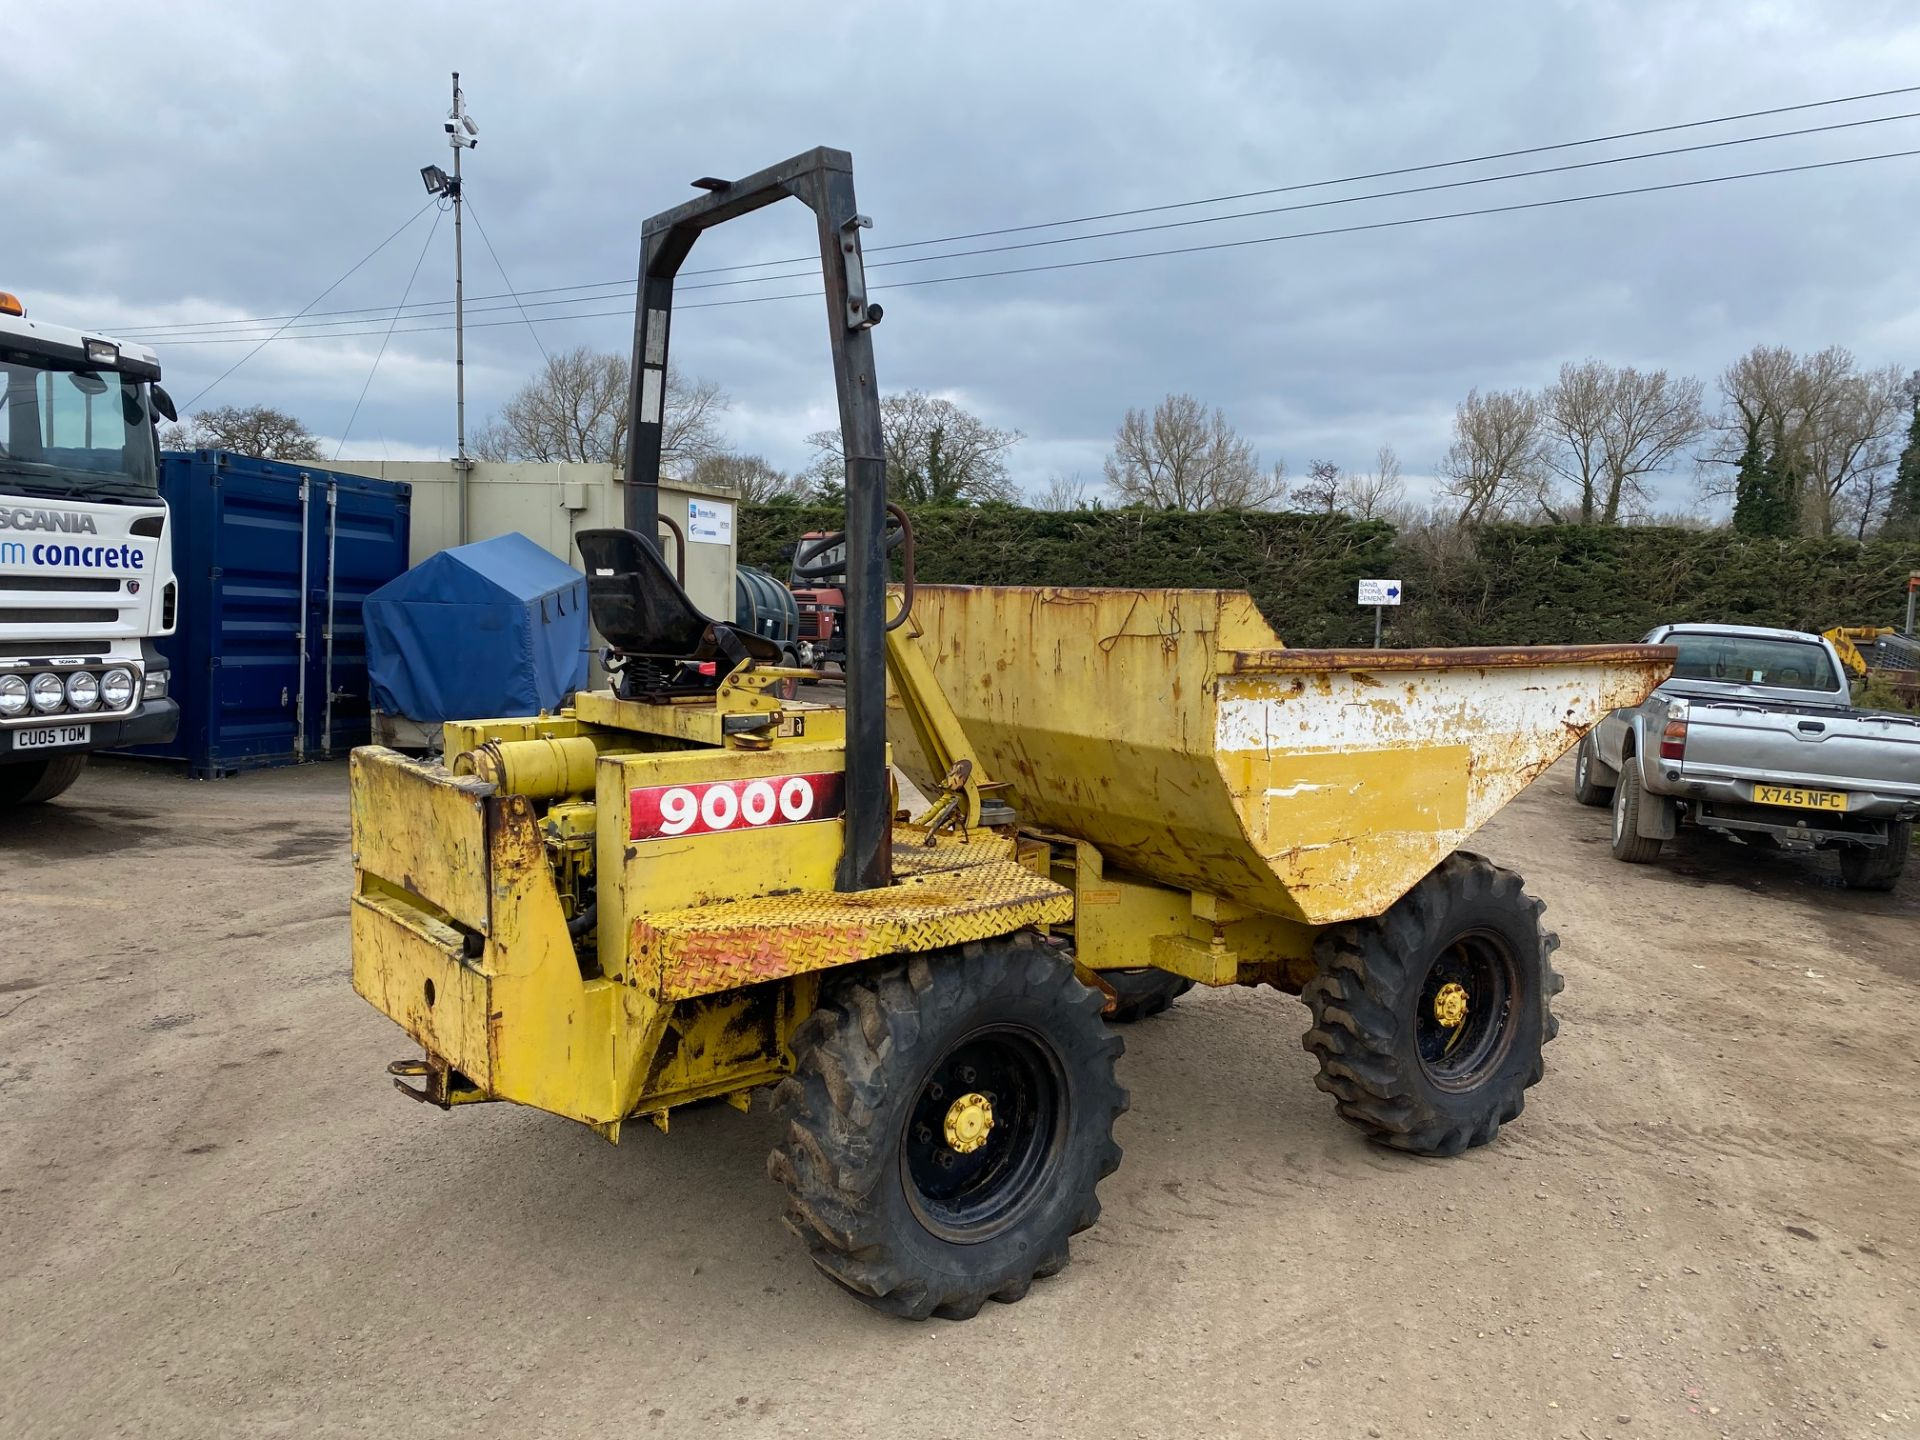 Thwaites 4 ton dumper, 4x4, electric start, Roll bar, 3 cylinder Lister Petter engine - Image 2 of 5